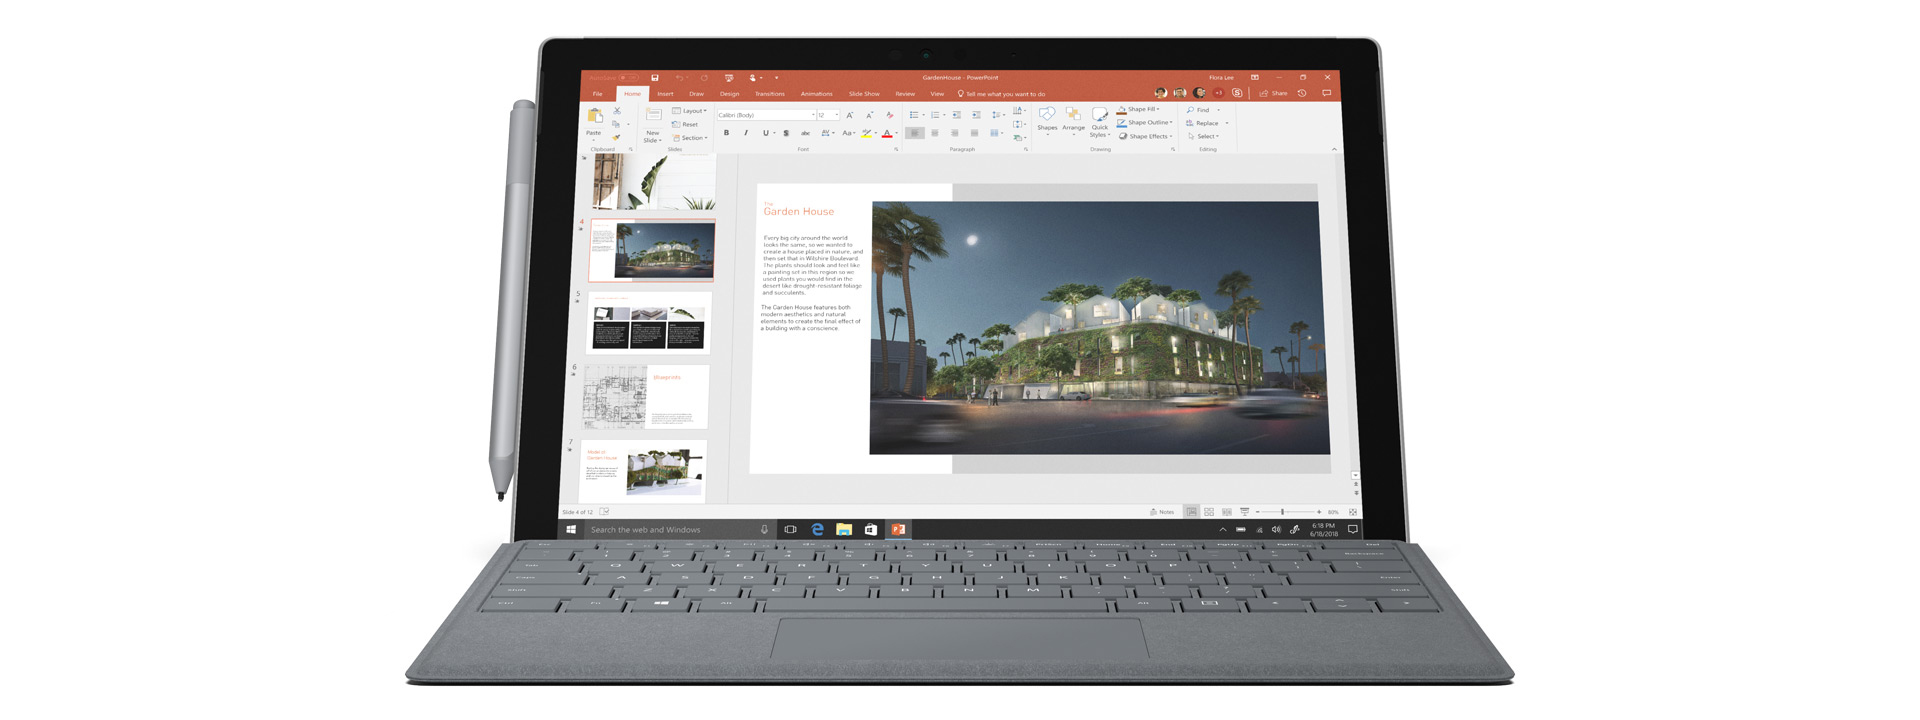 Surface Pro مع لوحة مفاتيحSurface Pro Signature Type Cover وقلم Surface Pen، أداة